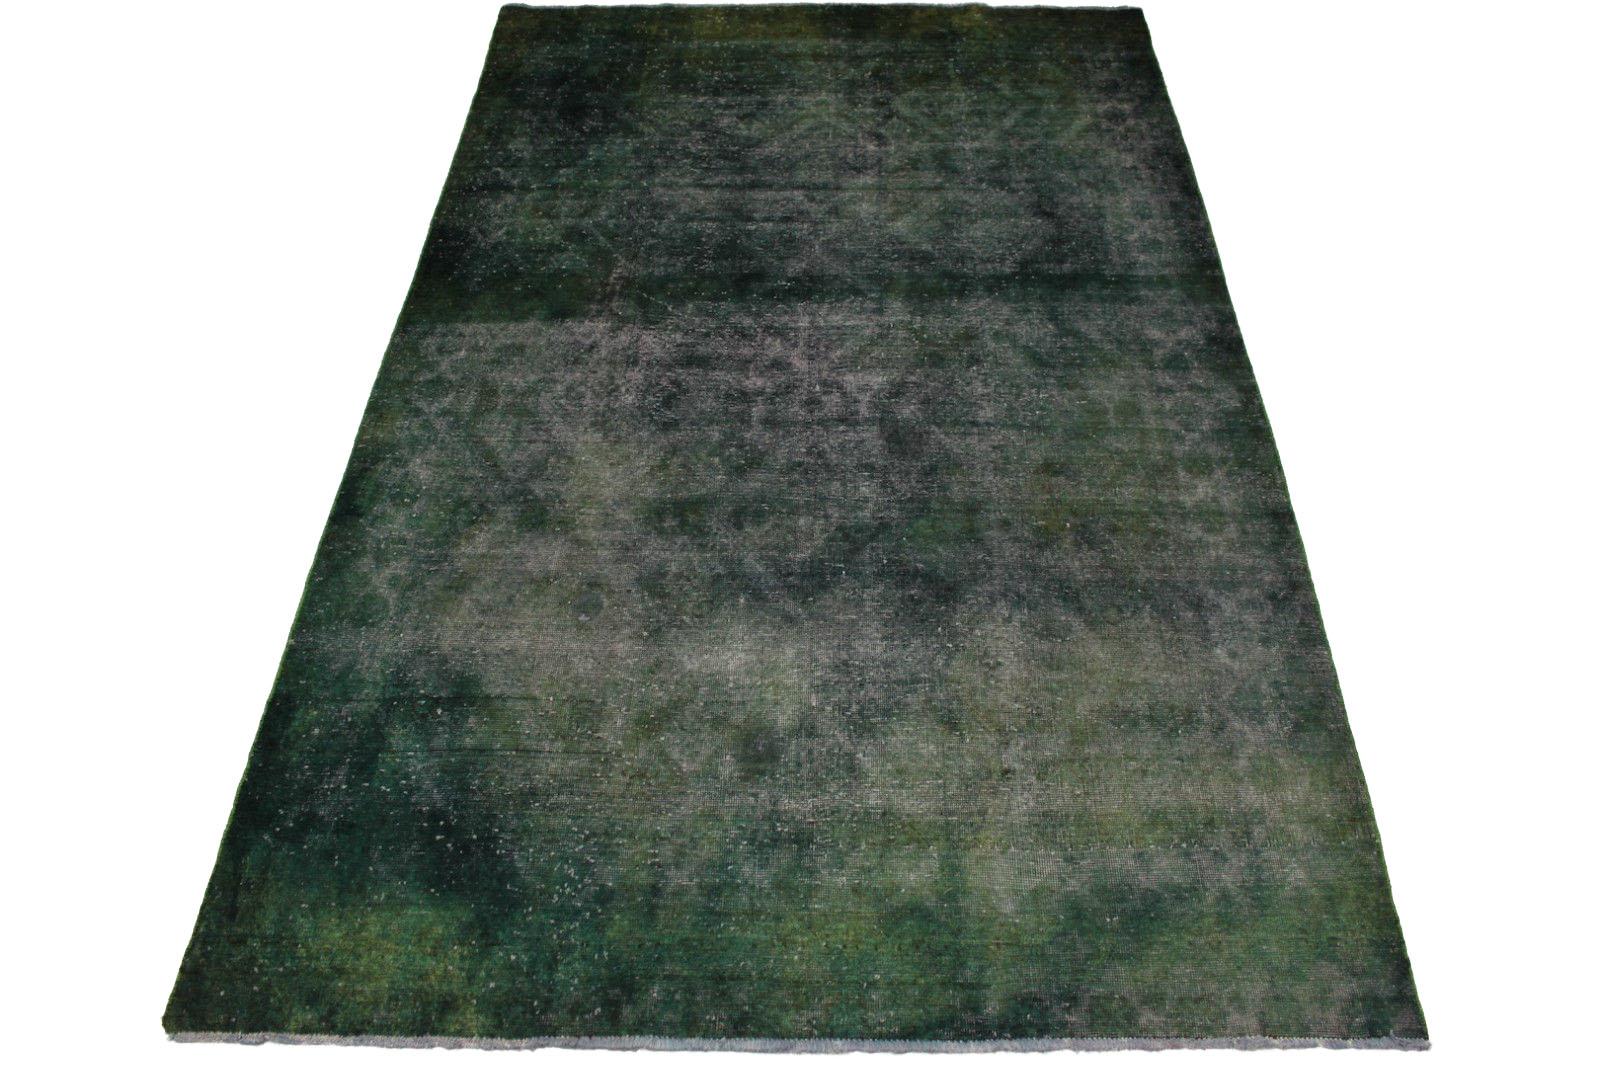 vintage teppich gr n grau in 300x200cm 1001 2934 bei. Black Bedroom Furniture Sets. Home Design Ideas